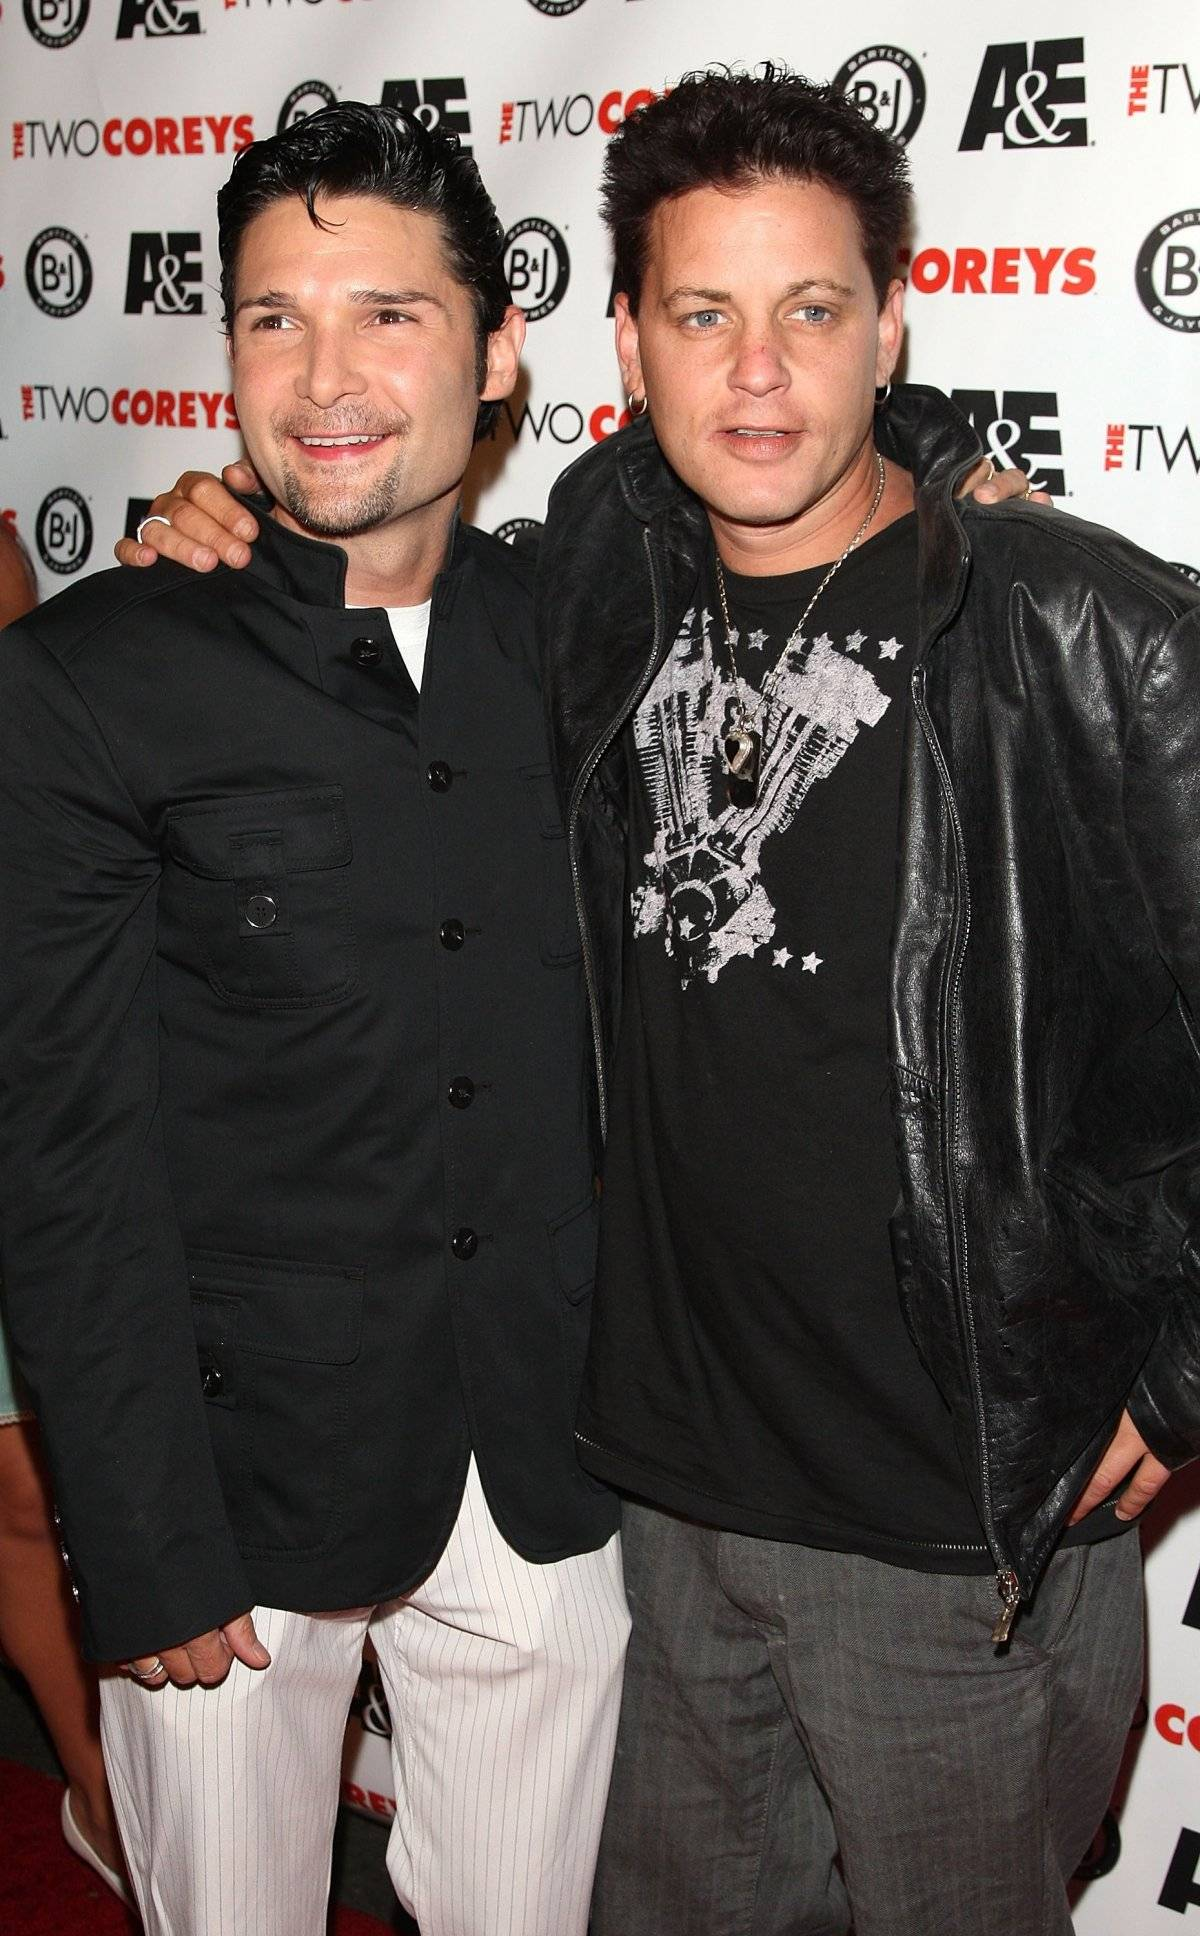 Corey Feldman y Corey Haim